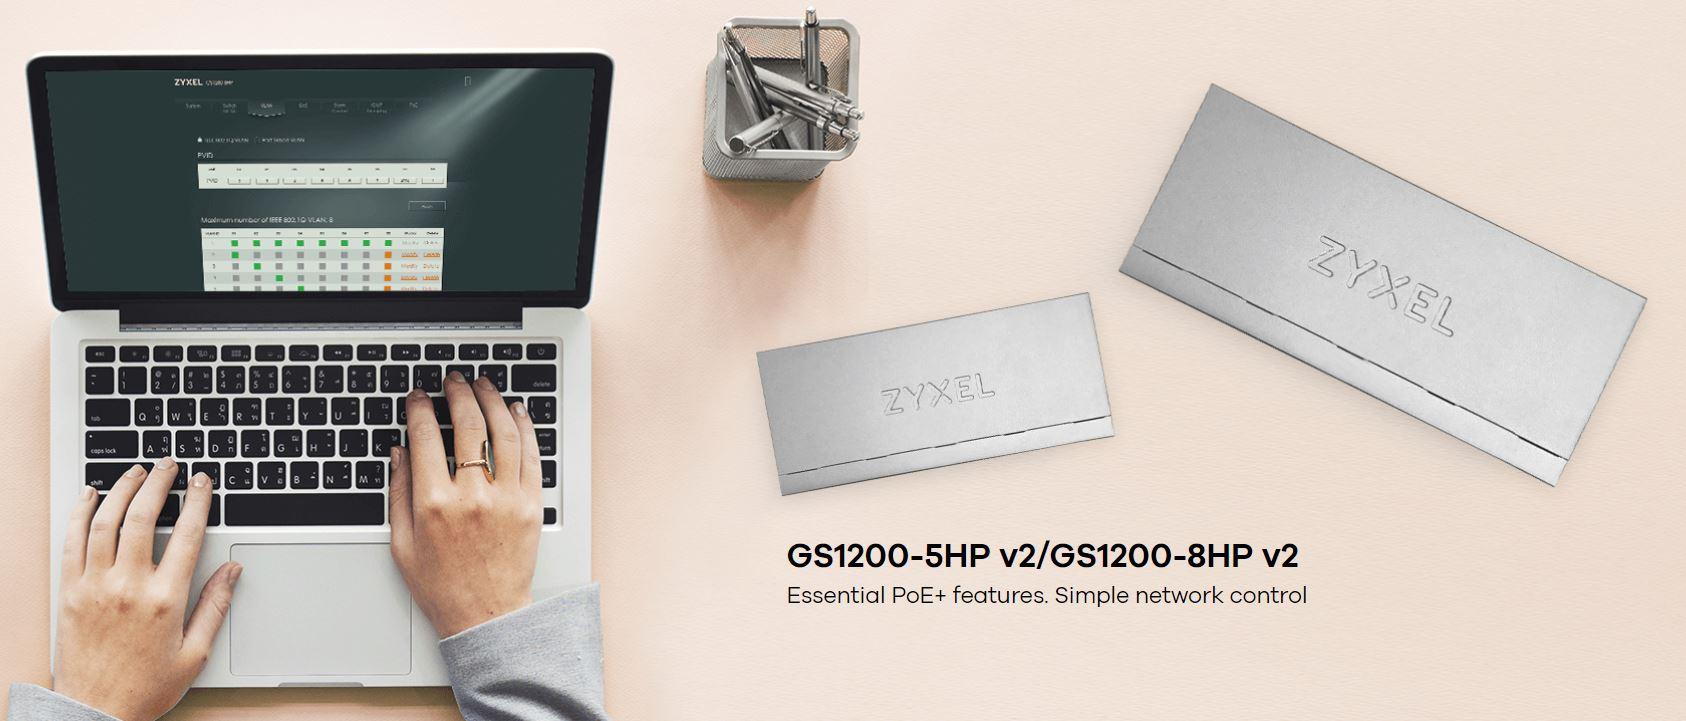 Zyxel GS1200-5HP v2 5-Port Web Managed PoE Gigabit Switch